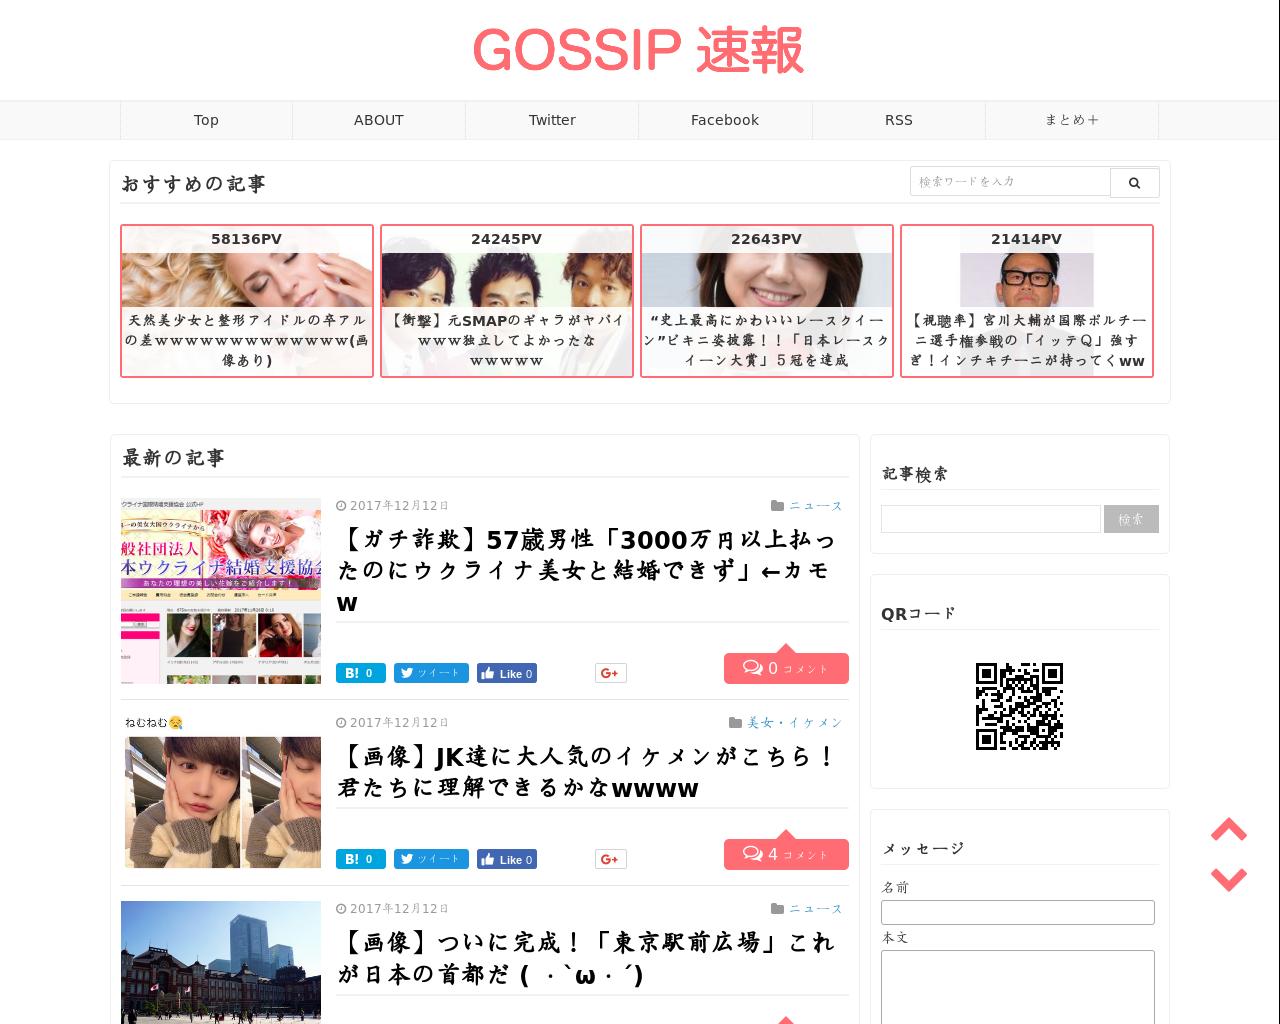 gossip1.net(2017/12/12 12:20:40)